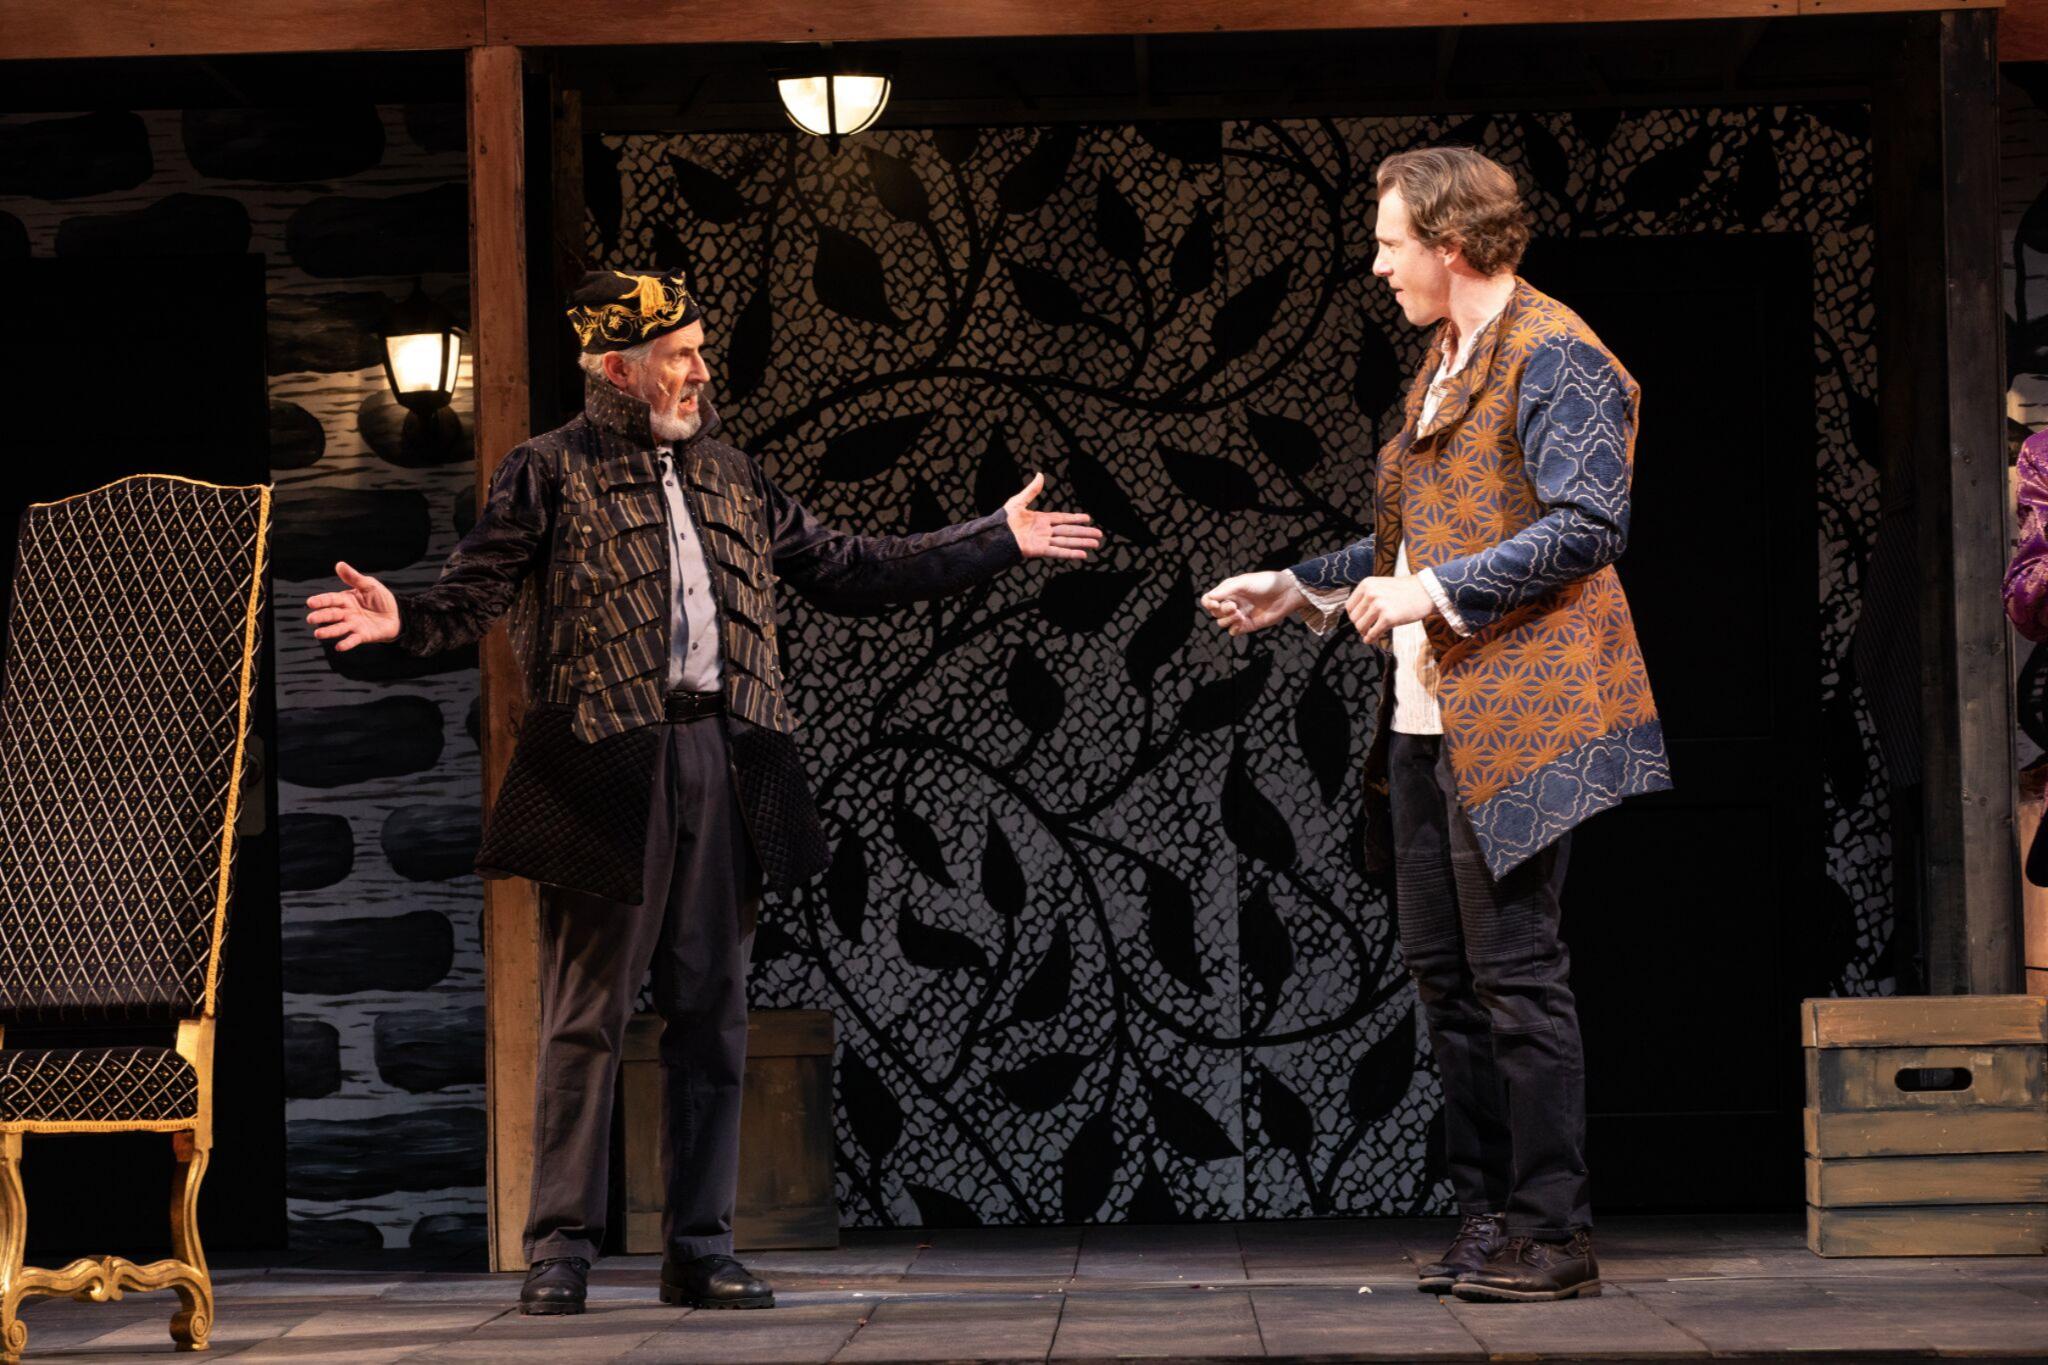 Richard Noble (Philario) and Jesse Hinson (Iachimo) in Cymbeline, Shakespeare on the Common 2019-Photo by Evgenia Eliseeva